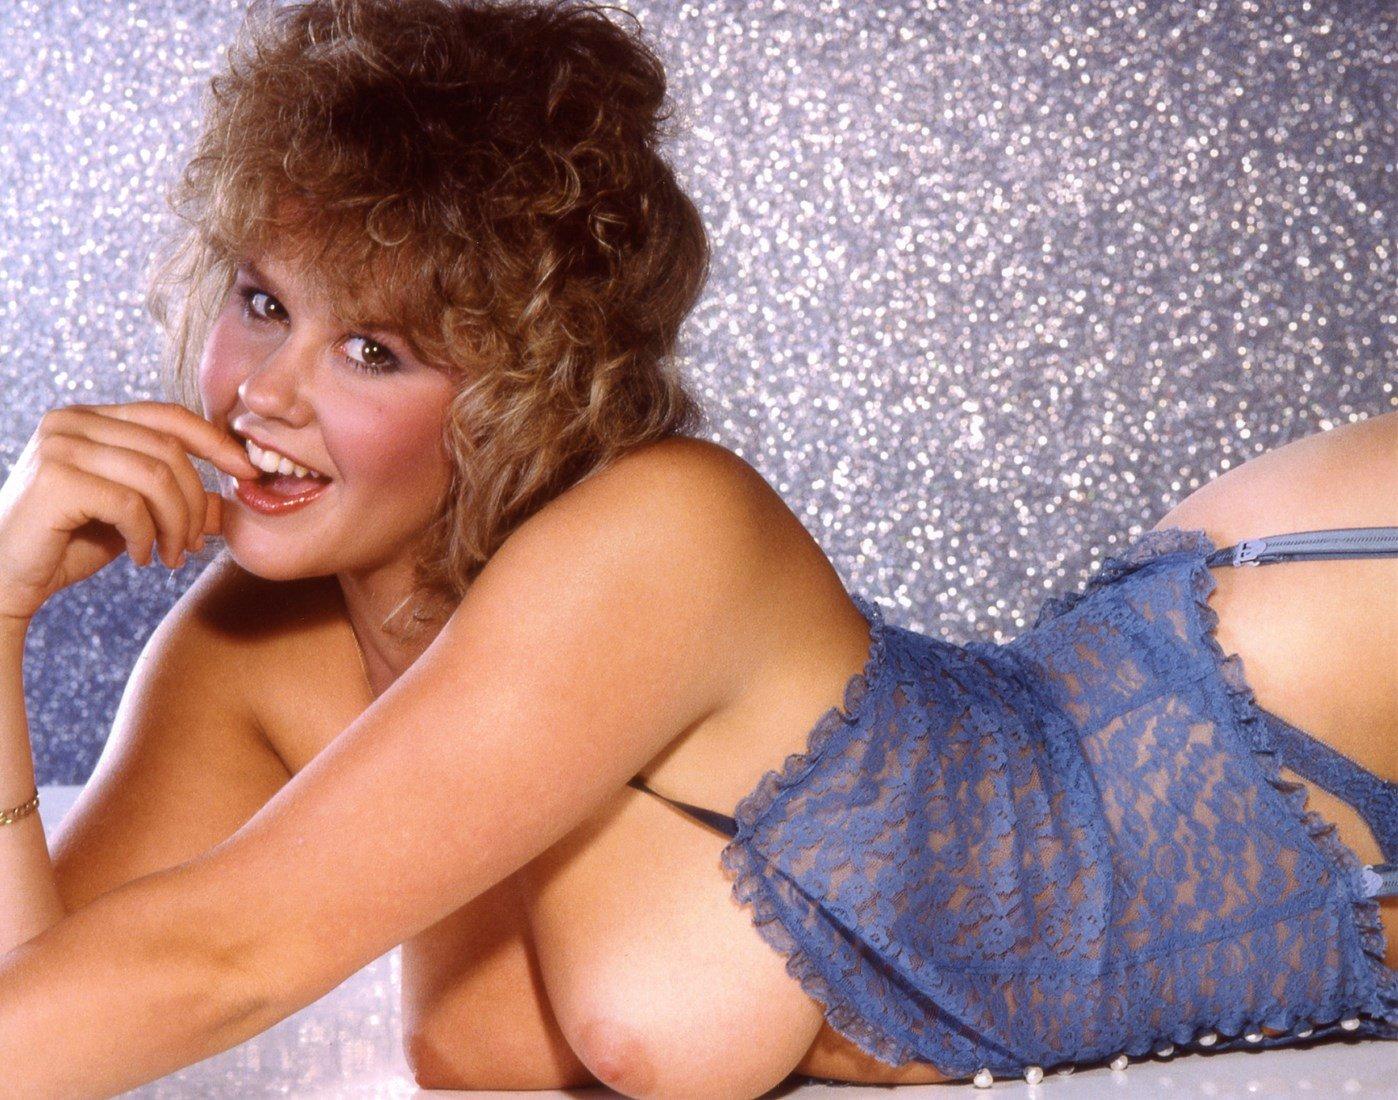 Linda blair nude photos sex scene pics